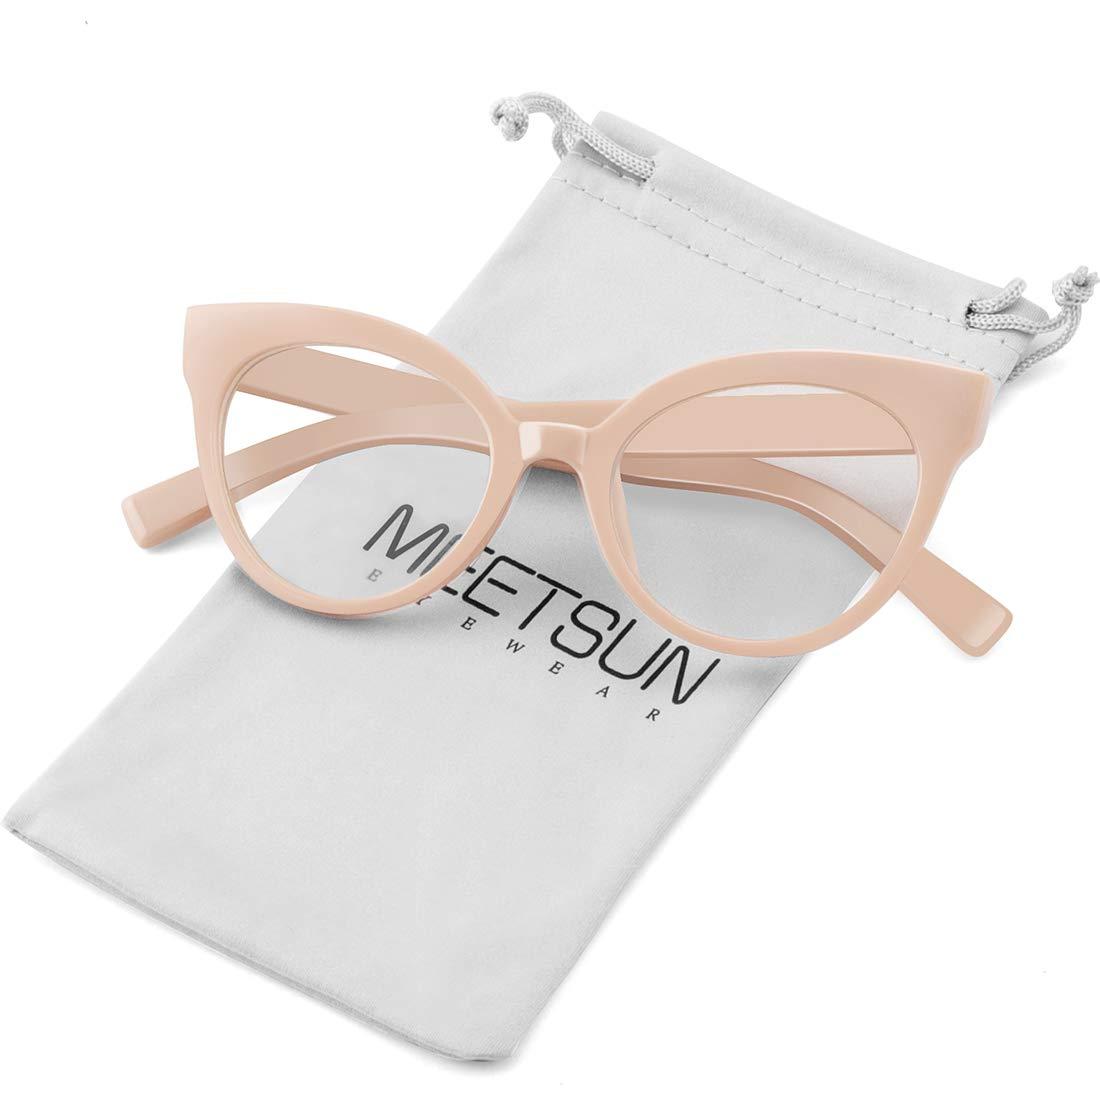 0ac29235e443 Amazon.com: MEETSUN Womens Cat Eye Glasses Frame Fashion Designer Non Prescription  Eyeglasses Clear Lens for ladies Beige Optical eyewear: Clothing